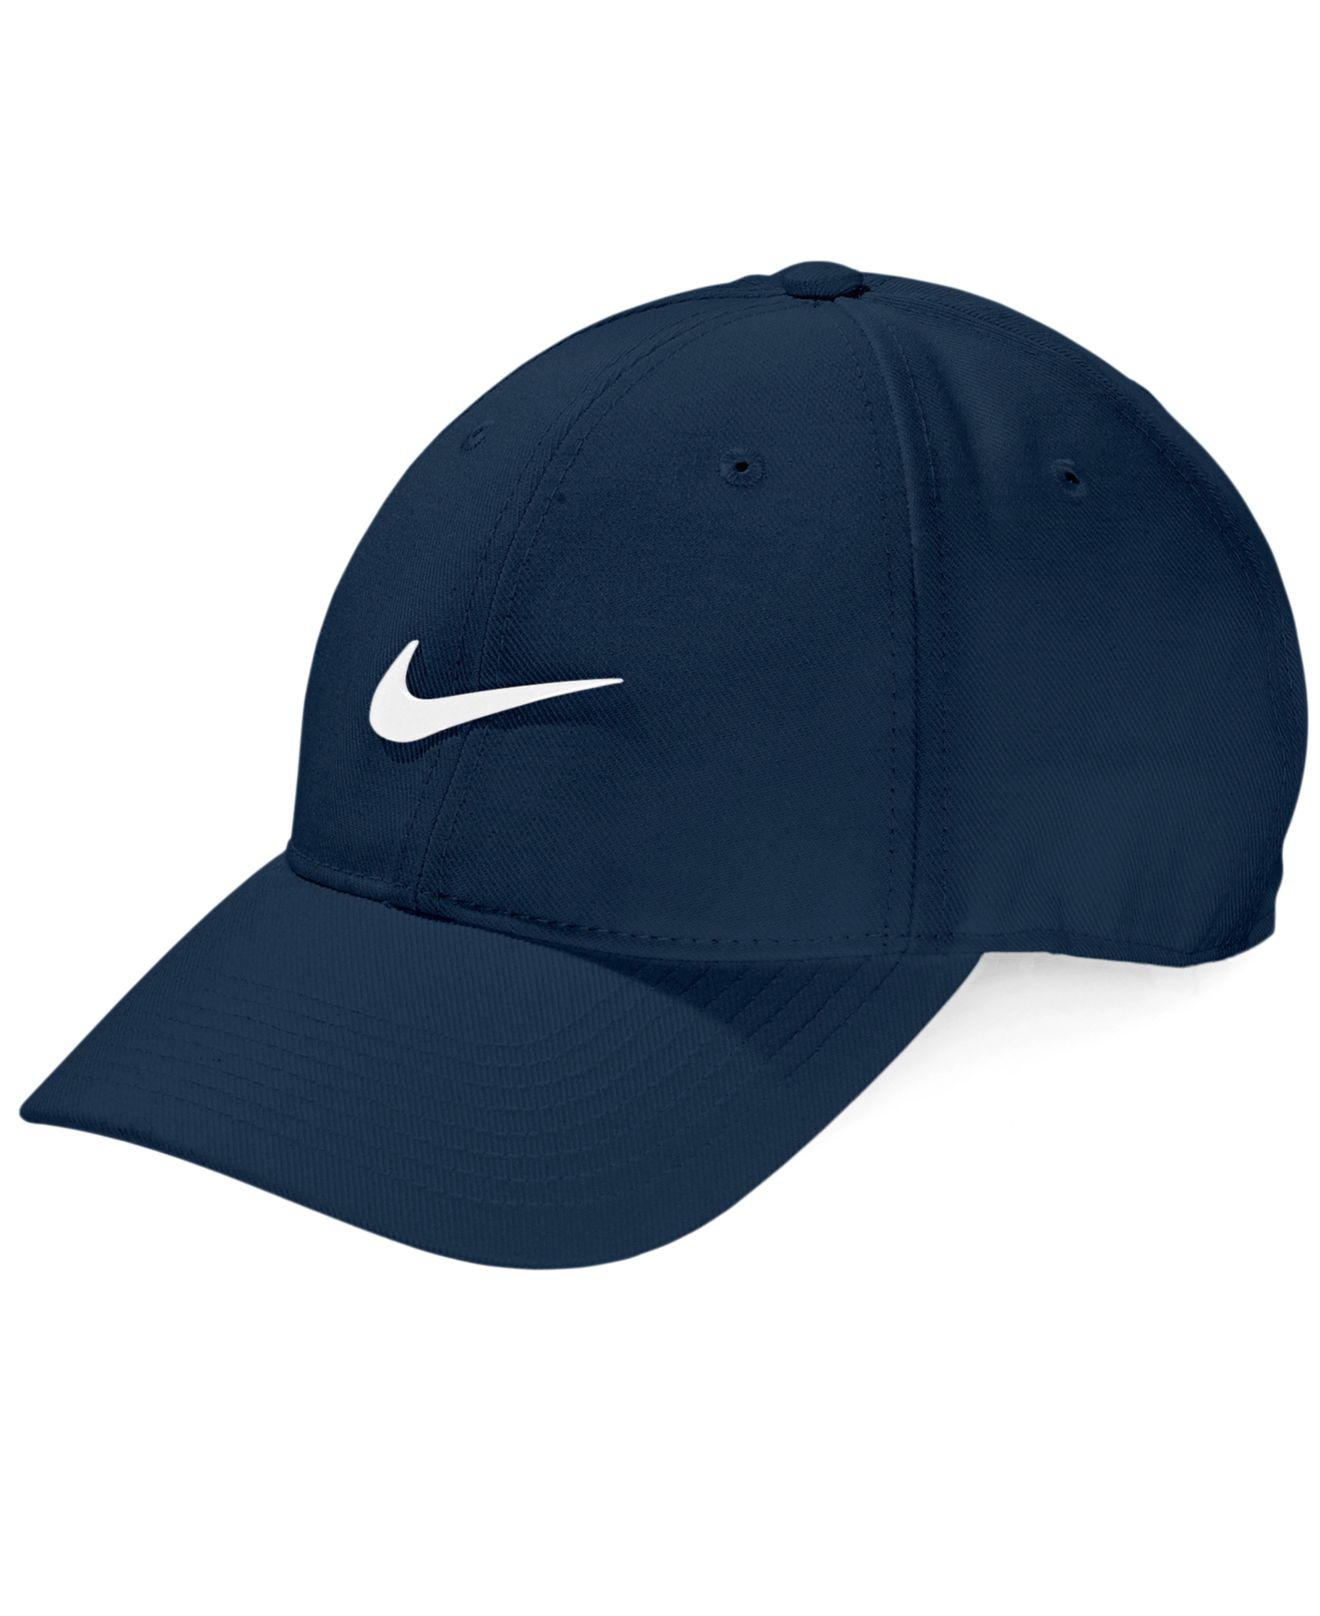 91b5e1fa459 Lyst - Nike Legacy Drifit Wool Adjustable Hat in Blue for Men